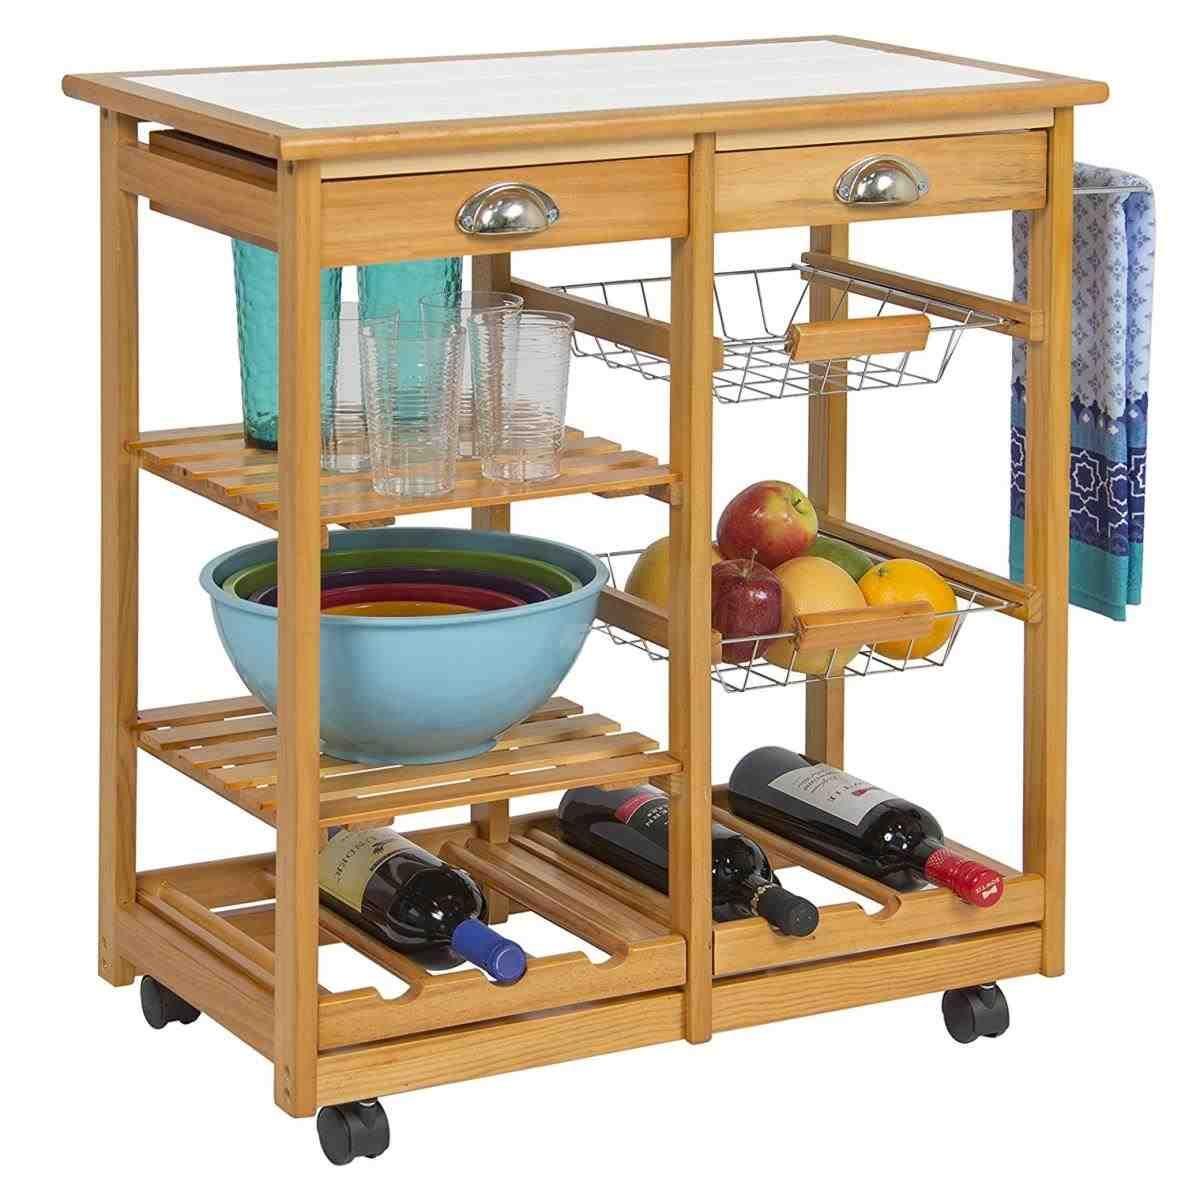 New Post narrow kitchen storage trolley | Woodworking ...